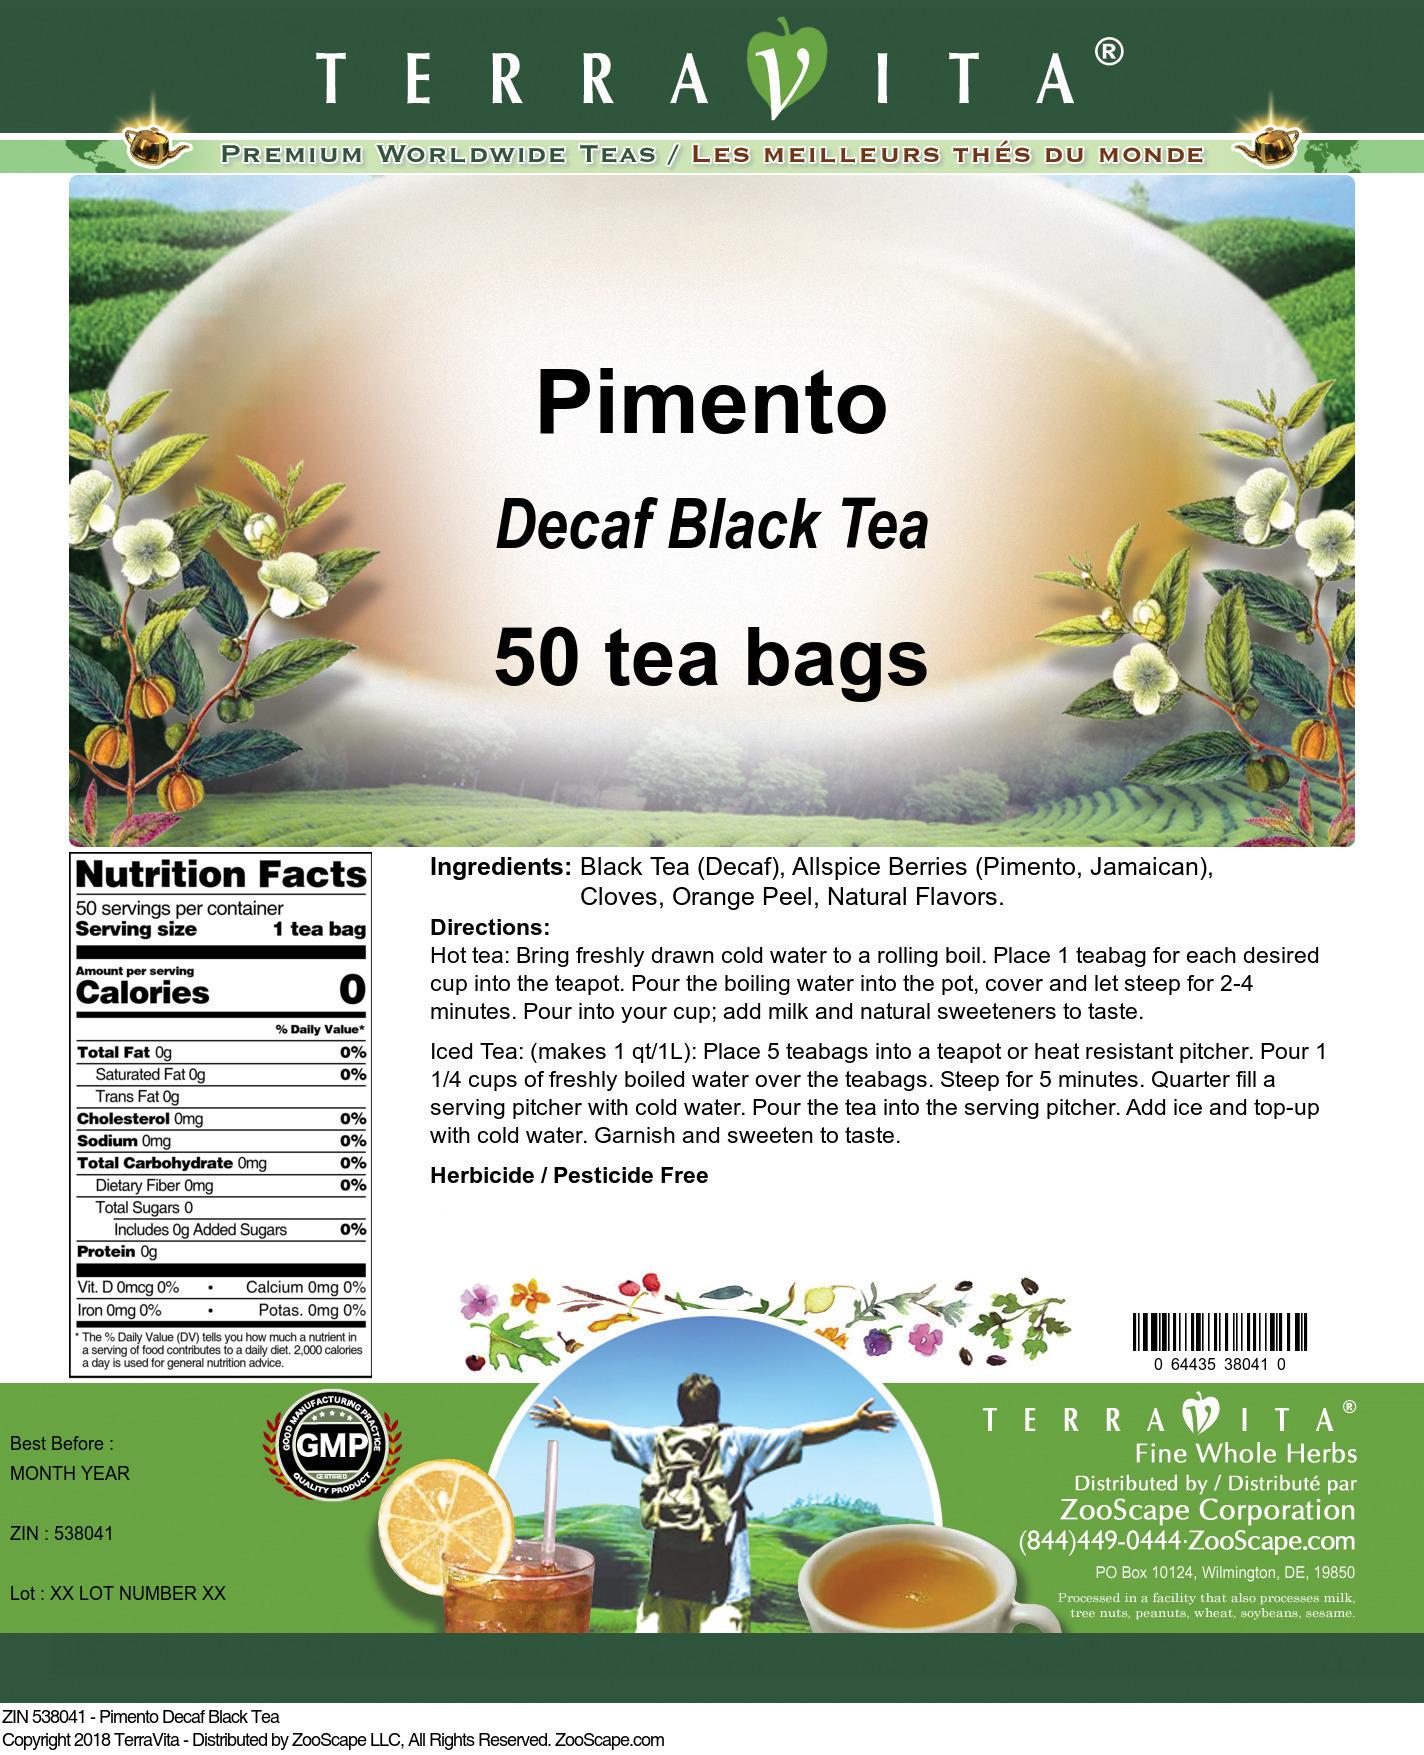 Pimento Decaf Black Tea